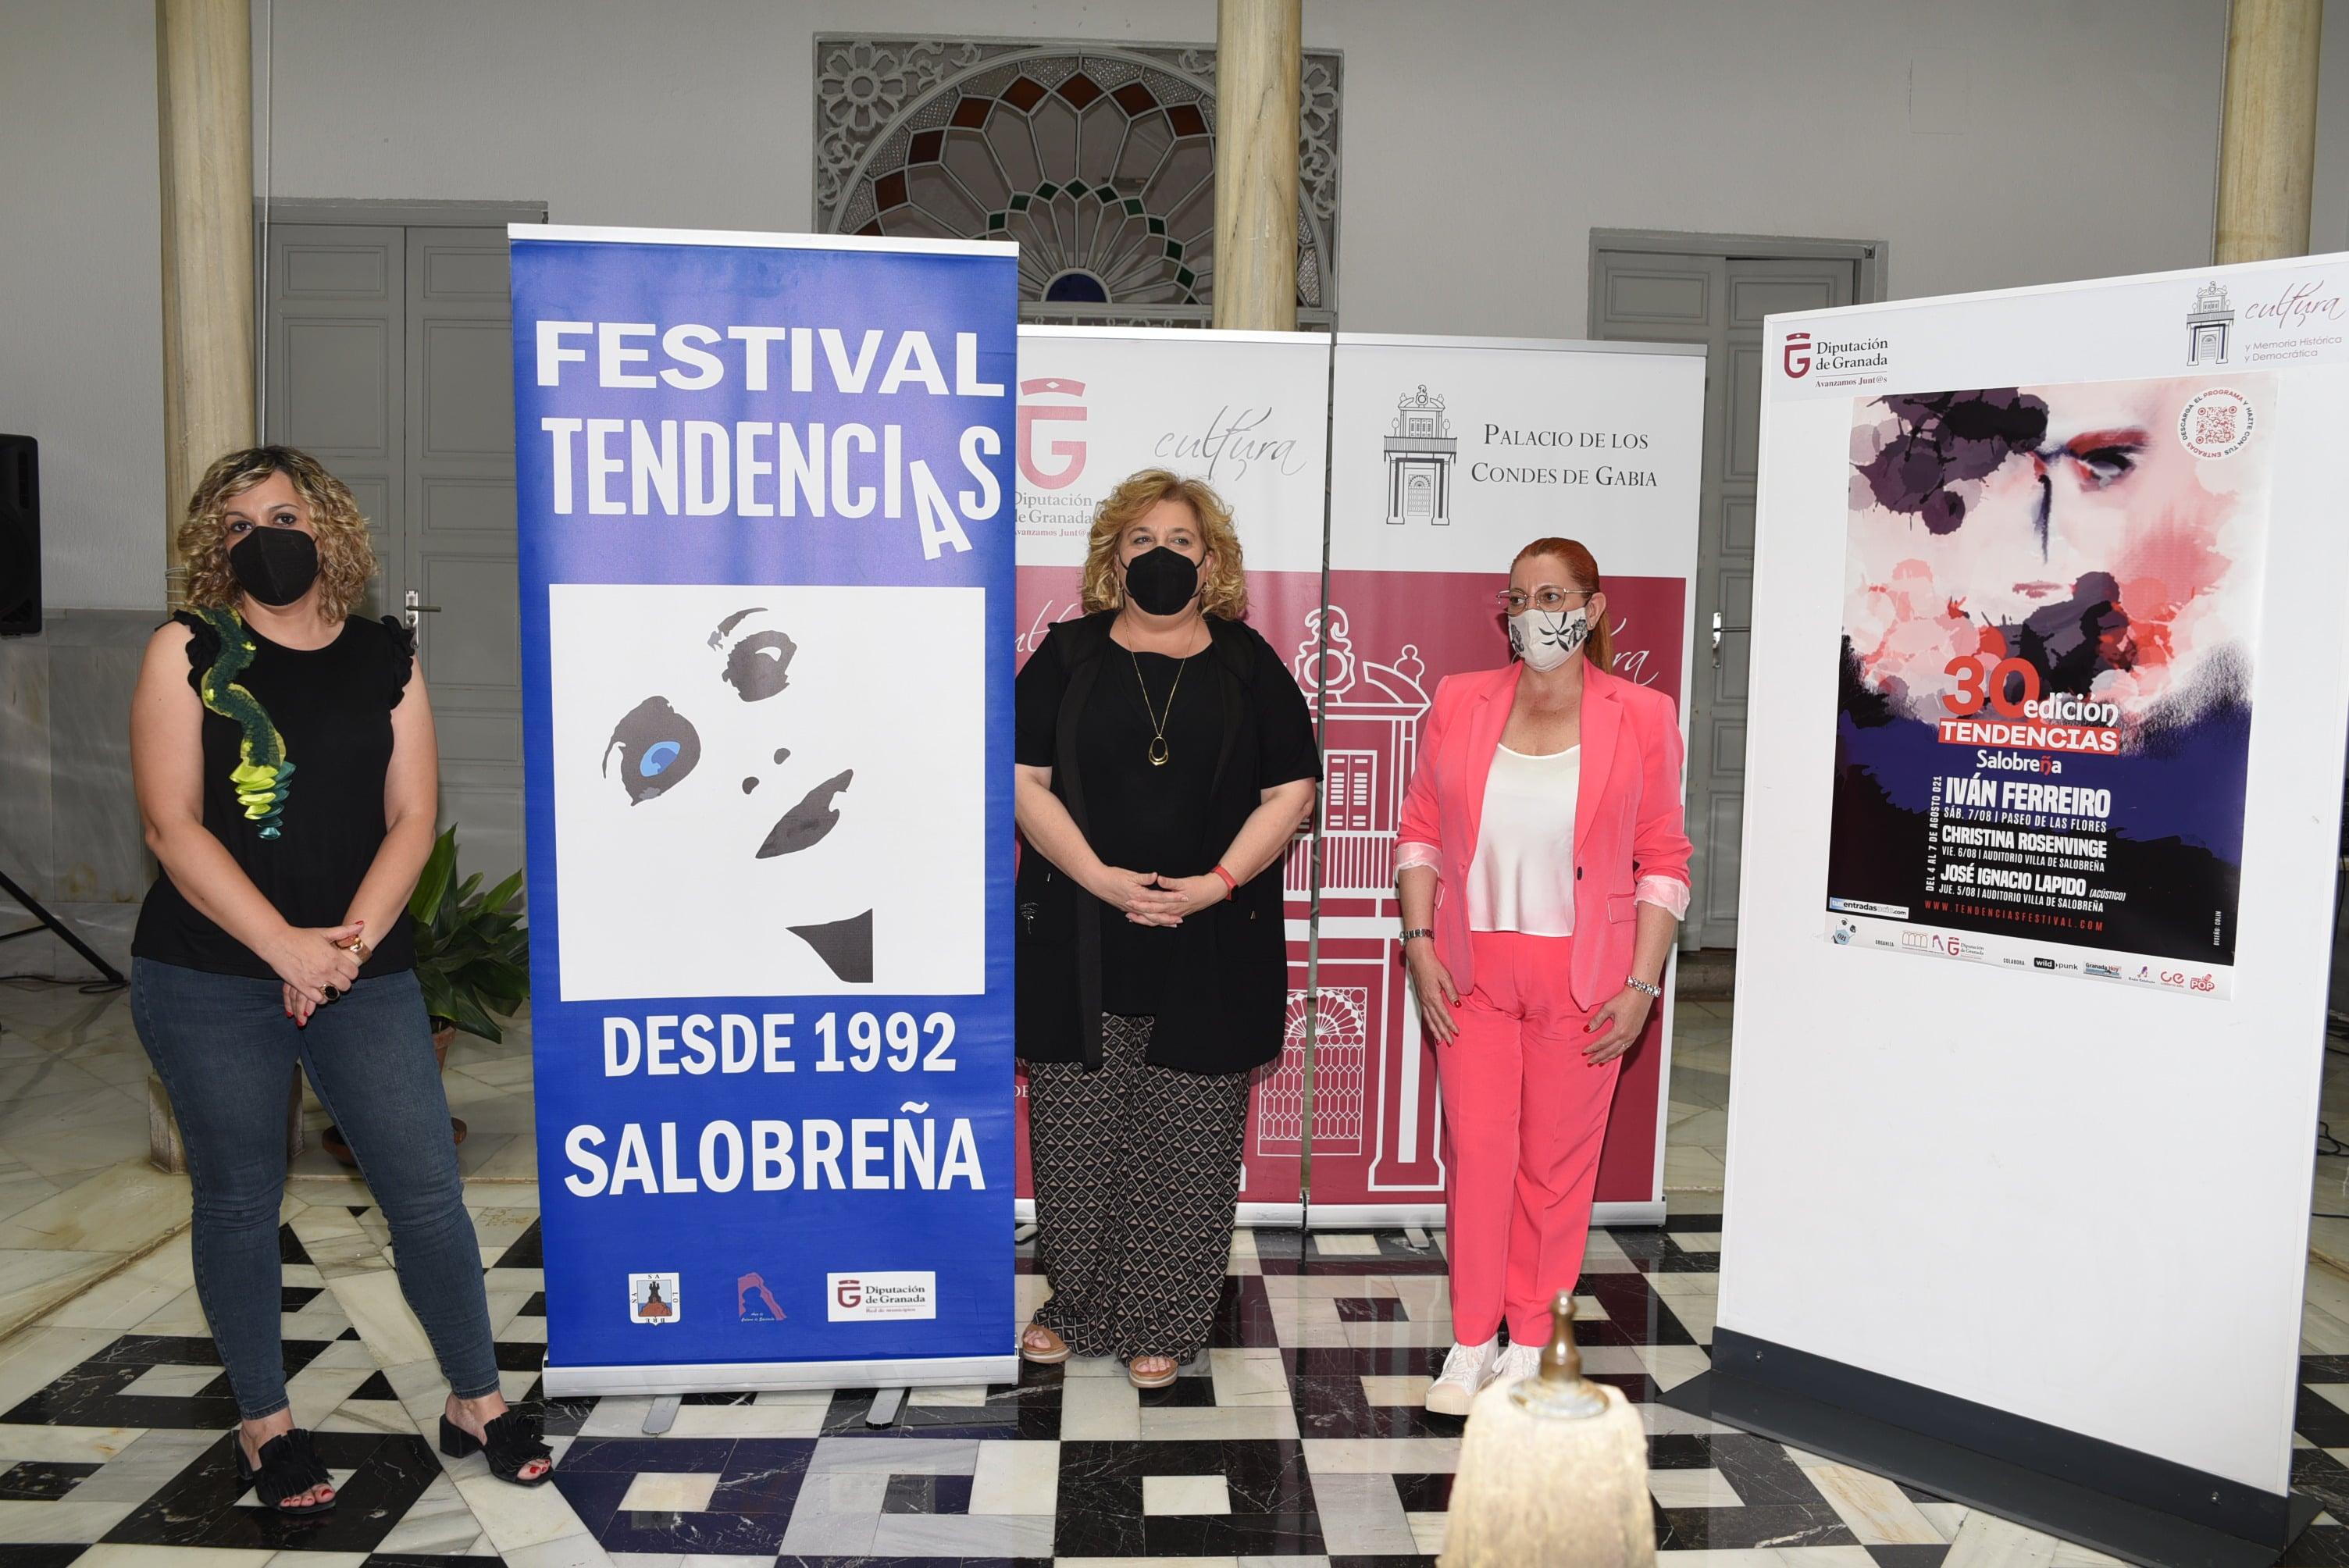 Iván Ferreiro encabeza el cartel del festival Tendencias de Salobreña